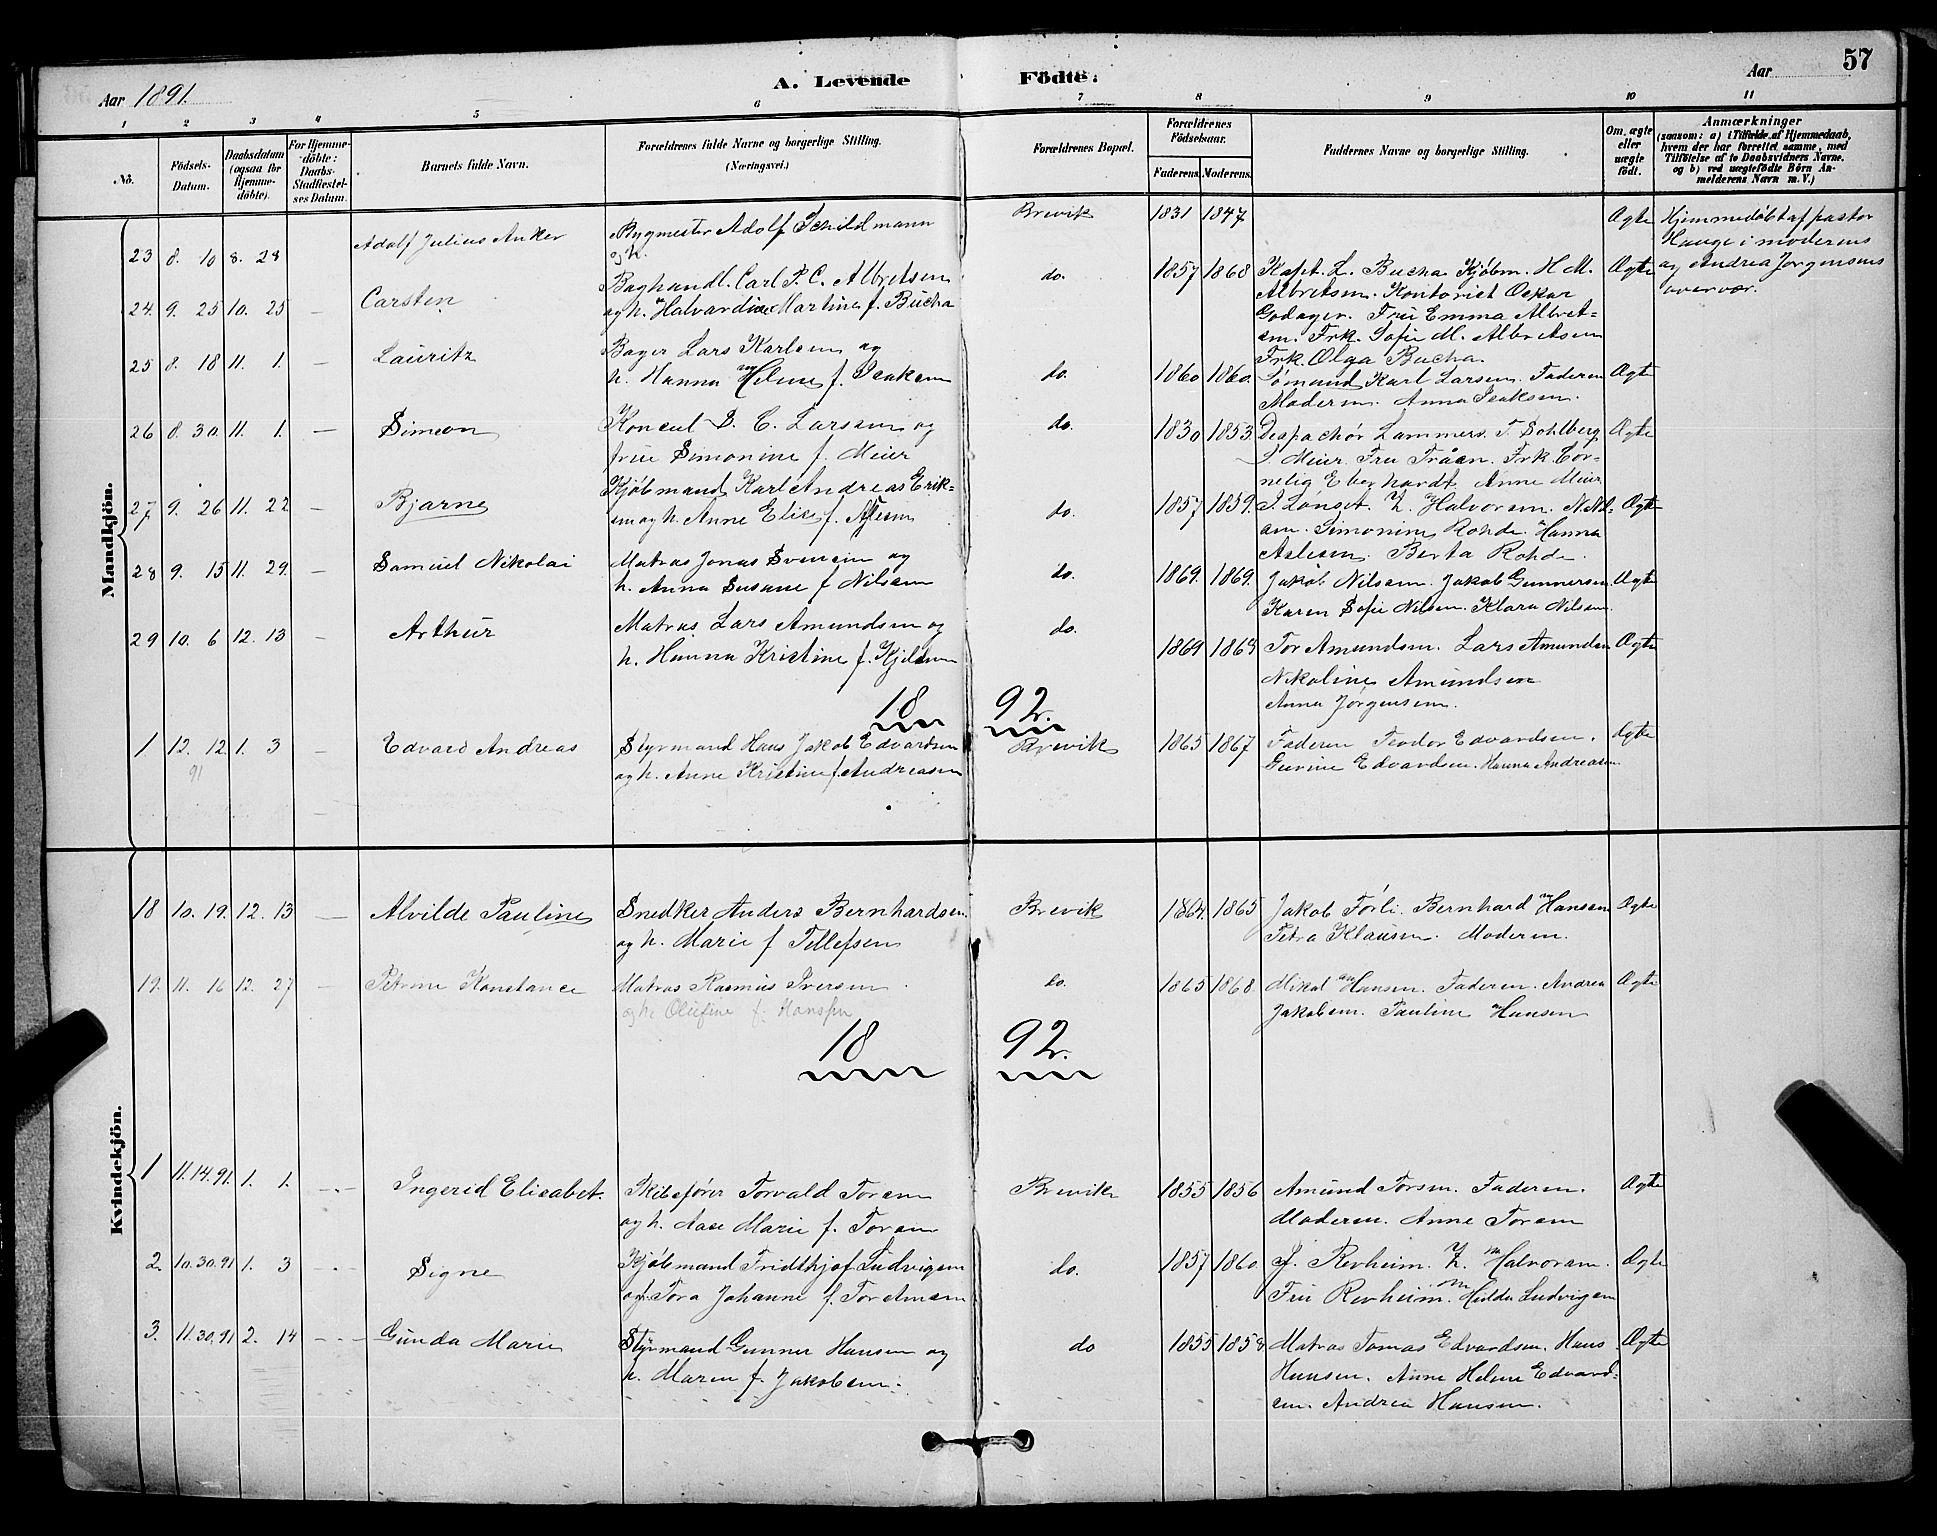 SAKO, Brevik kirkebøker, G/Ga/L0004: Klokkerbok nr. 4, 1882-1900, s. 57